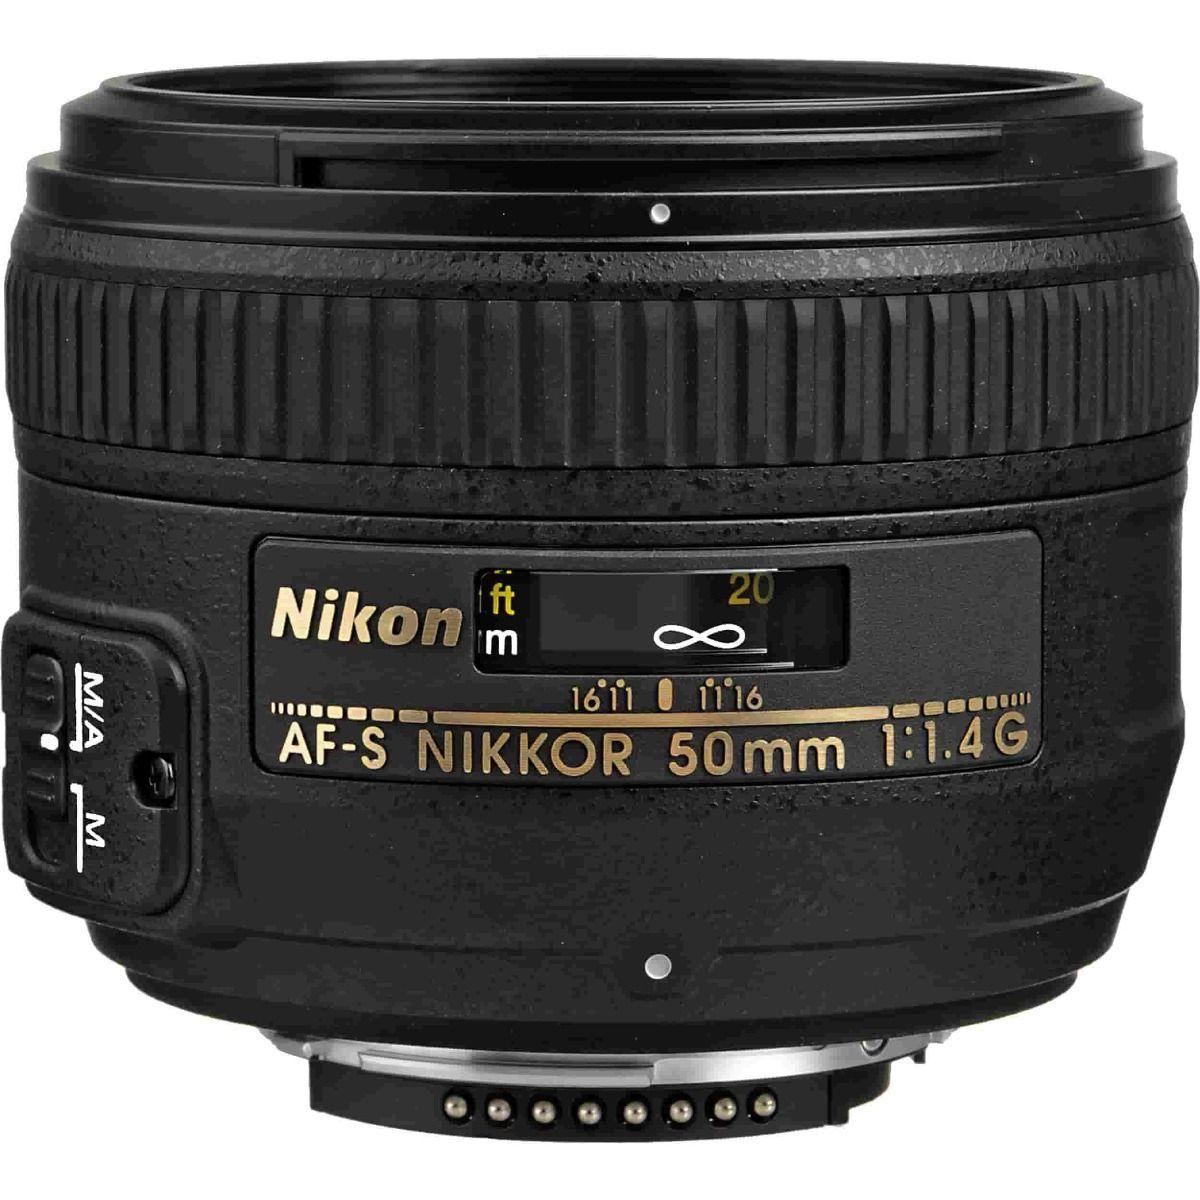 Nikon AF-S 50mm f/1.4G Lens,Nikon AF-S 50mm f/1.4G Lens,Nikon AF-S 50mm f/1.4G Lens